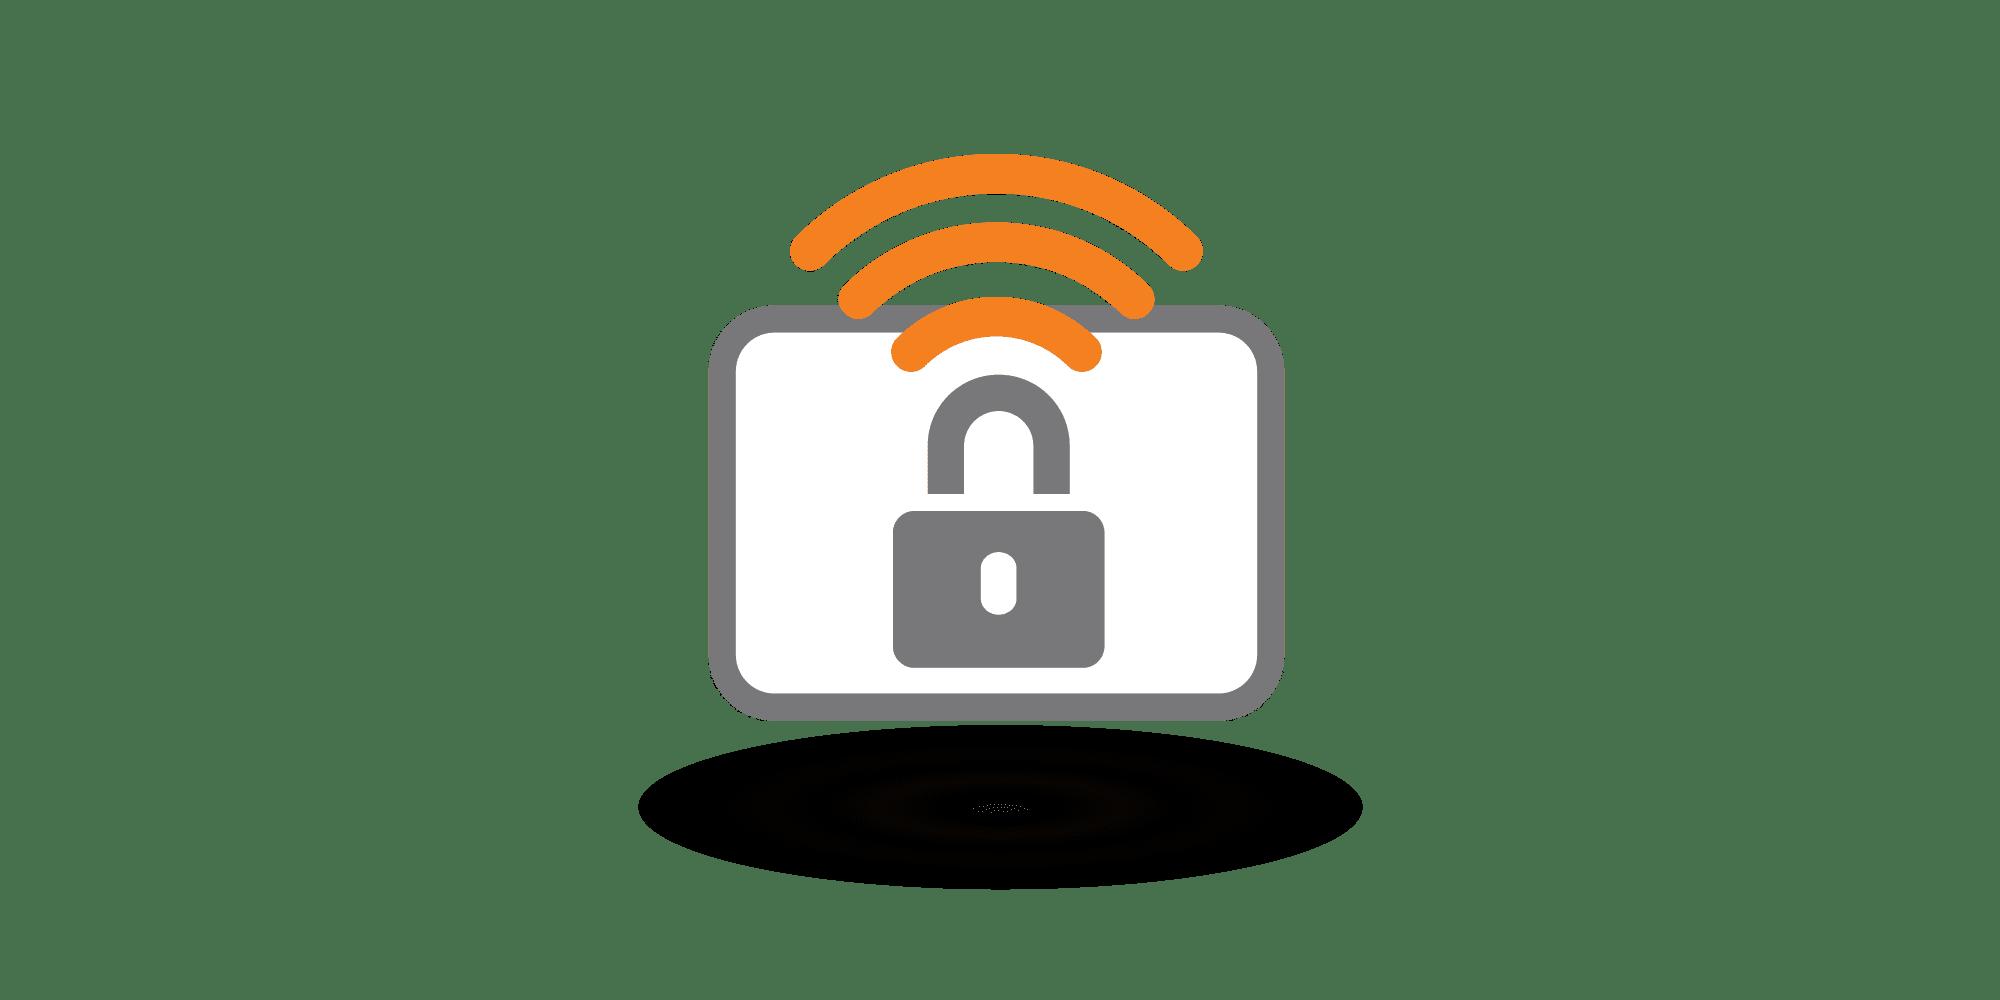 Lock clipart internet security. Cloudpath enrollment system ruckus